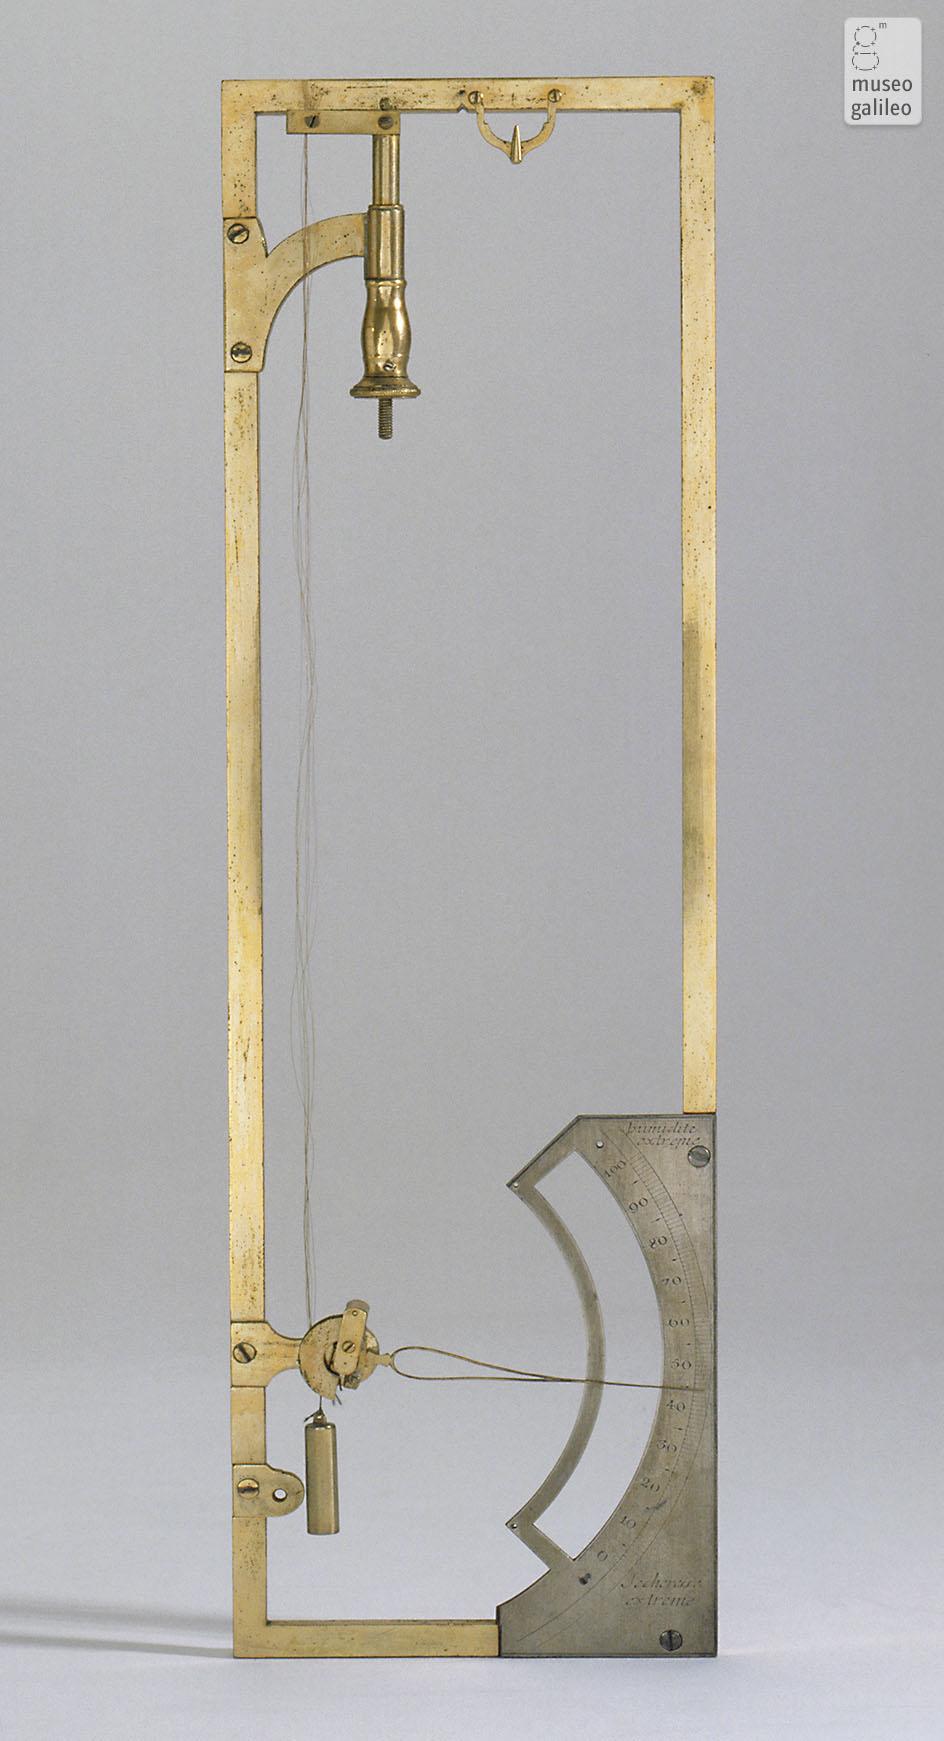 Museo Galileo Enlarged Image Saussure Hair Hygrometer